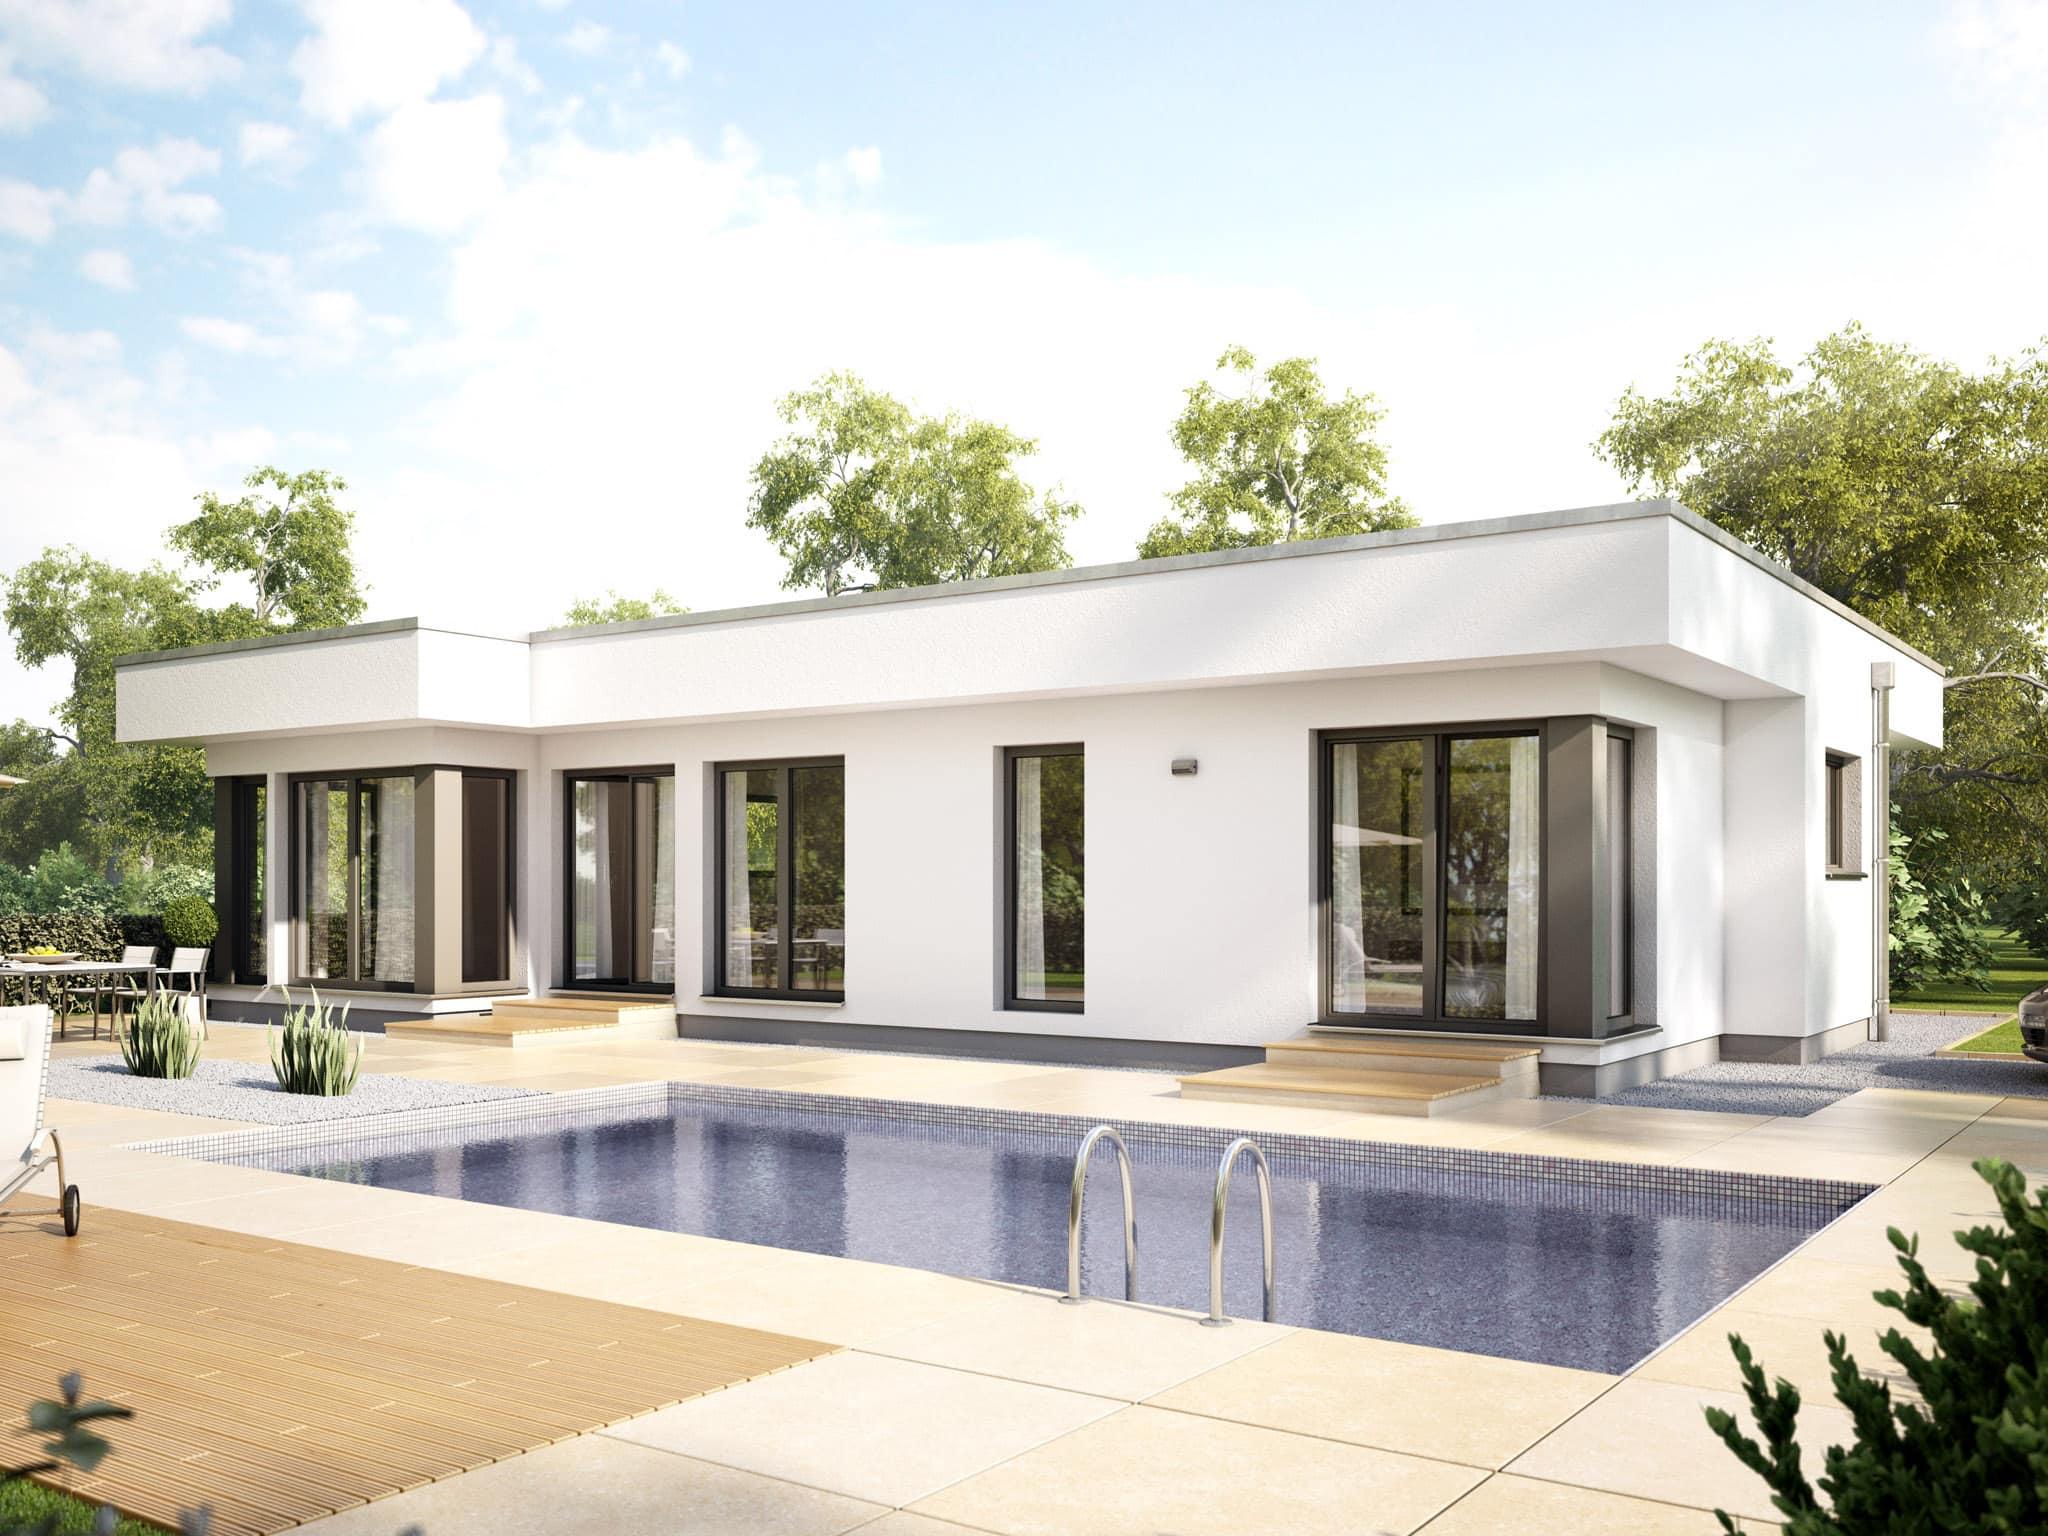 Bungalow AMBIENCE 100 V4 Fertighaus Flachdach Bien Zenker Haus